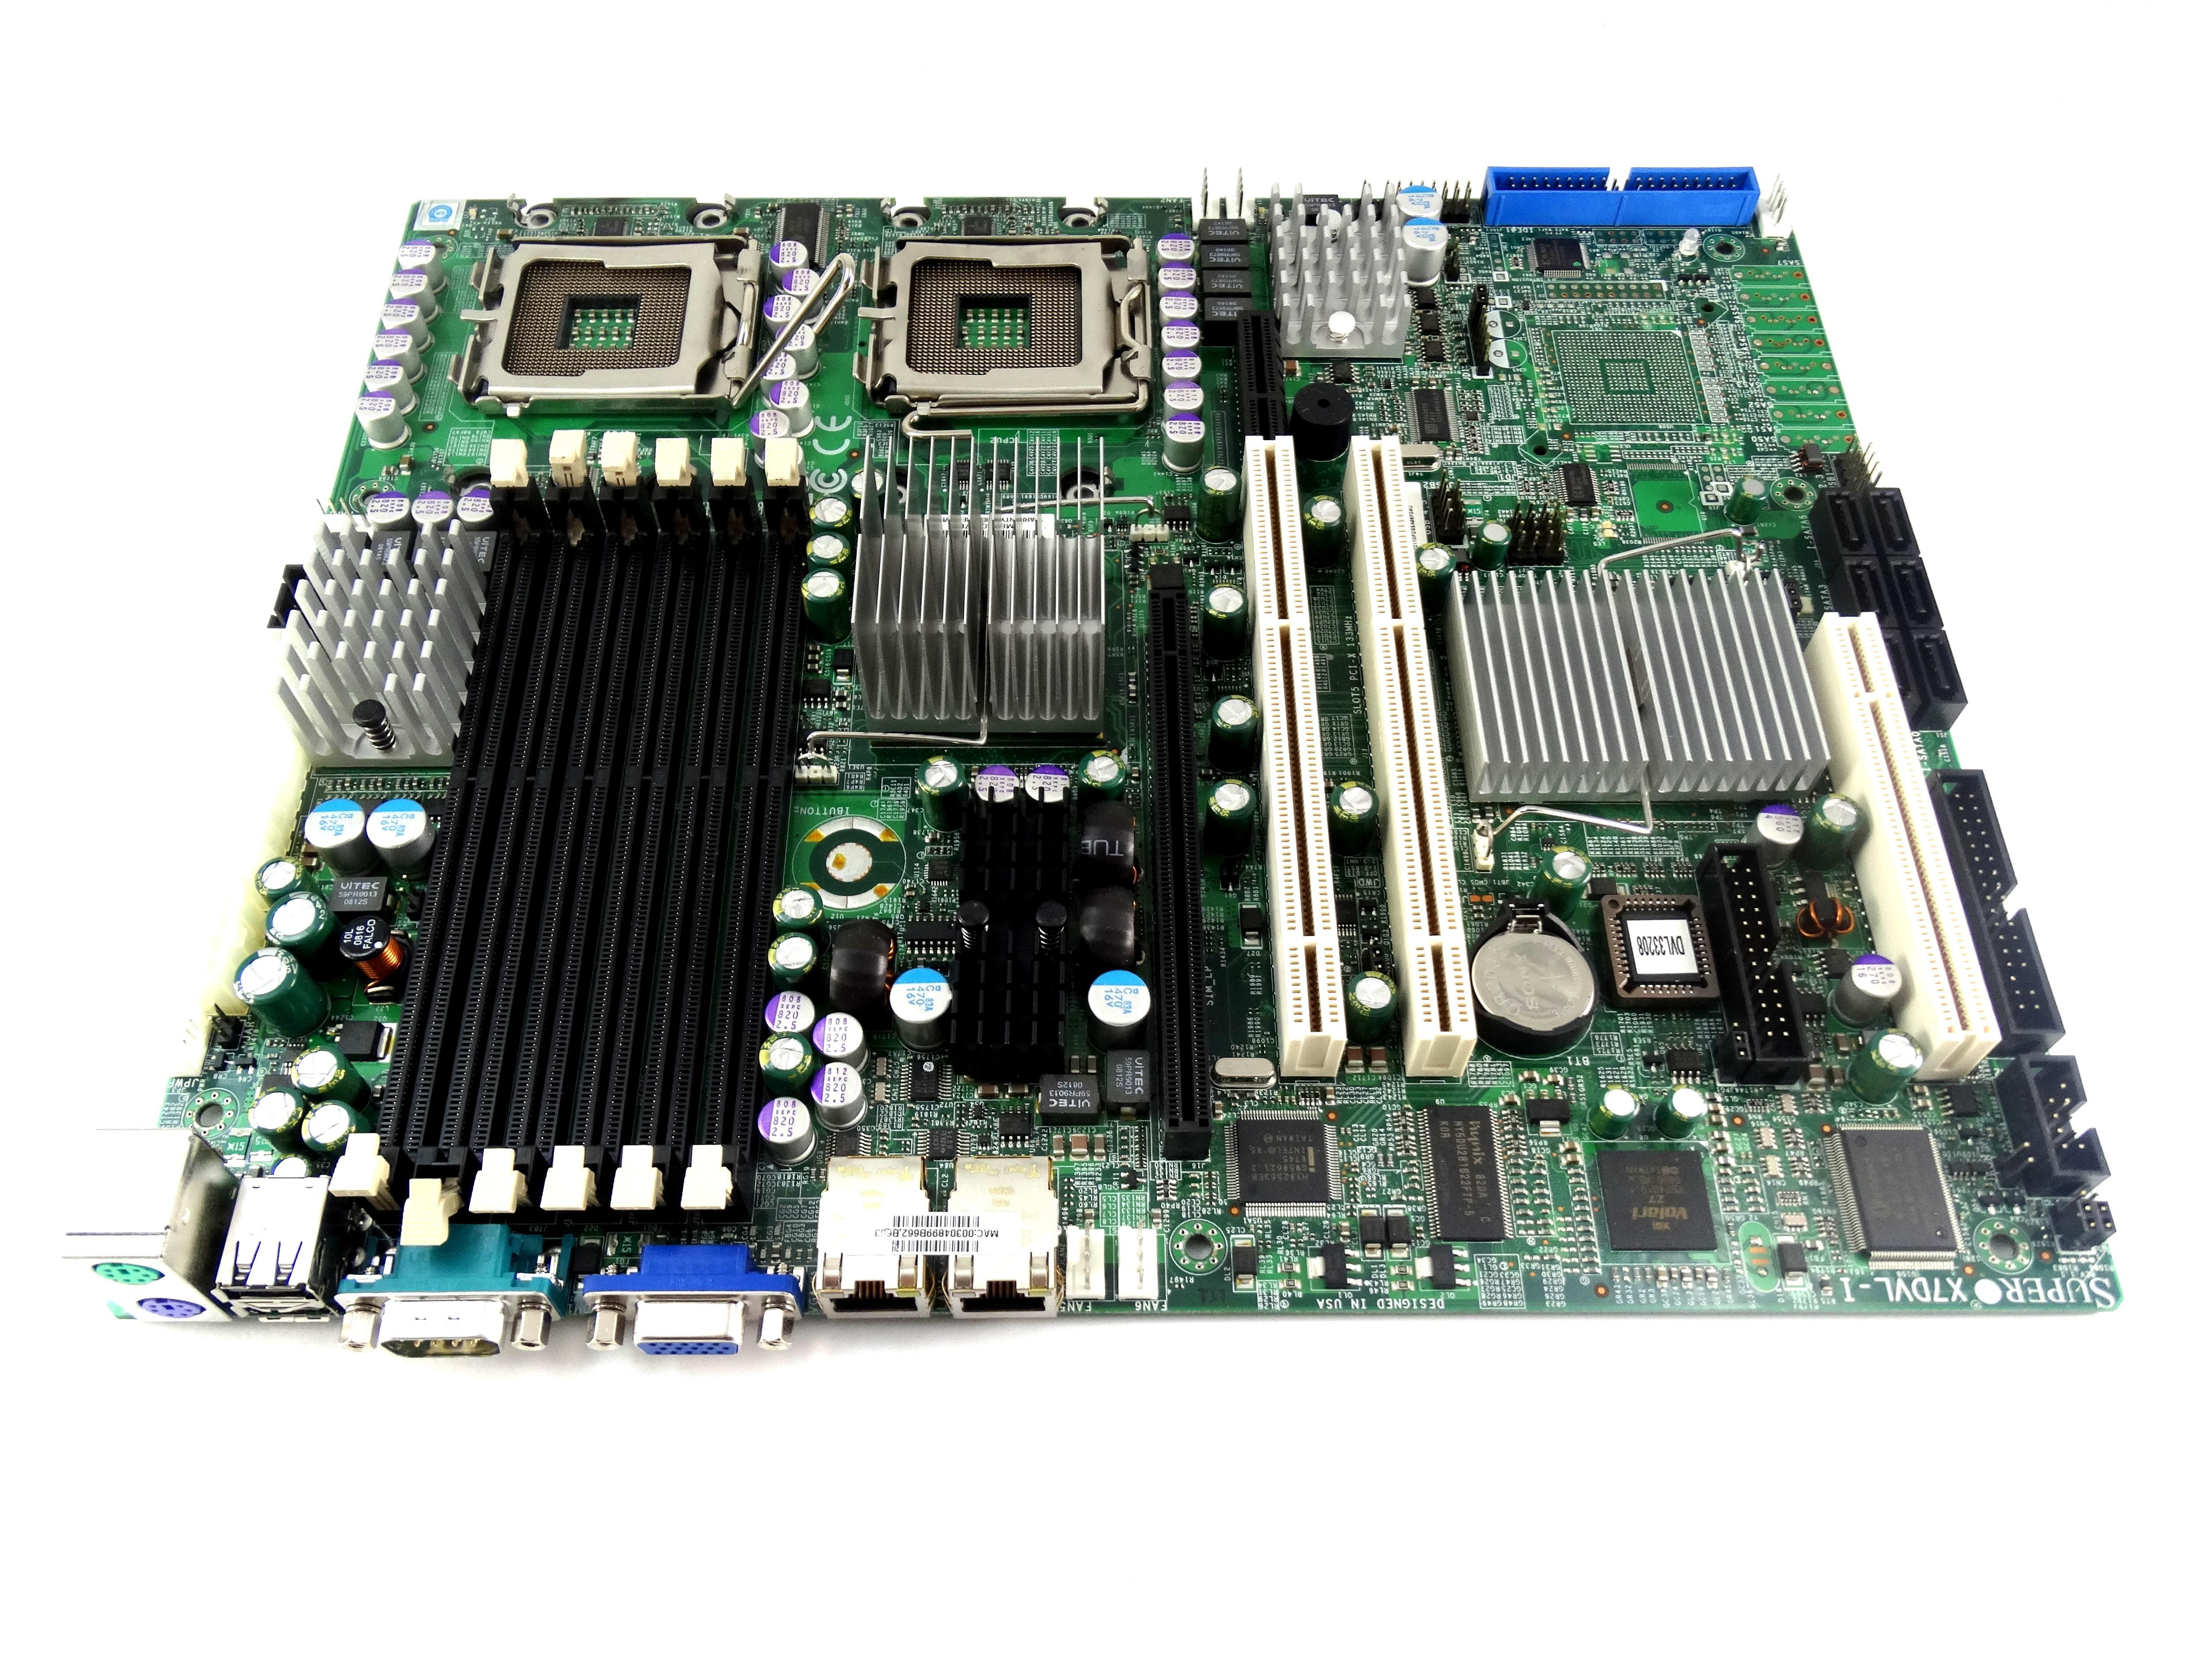 Supermicro Intel 5000V LGA771 ATX Server Motherboard (X7DVL-I)